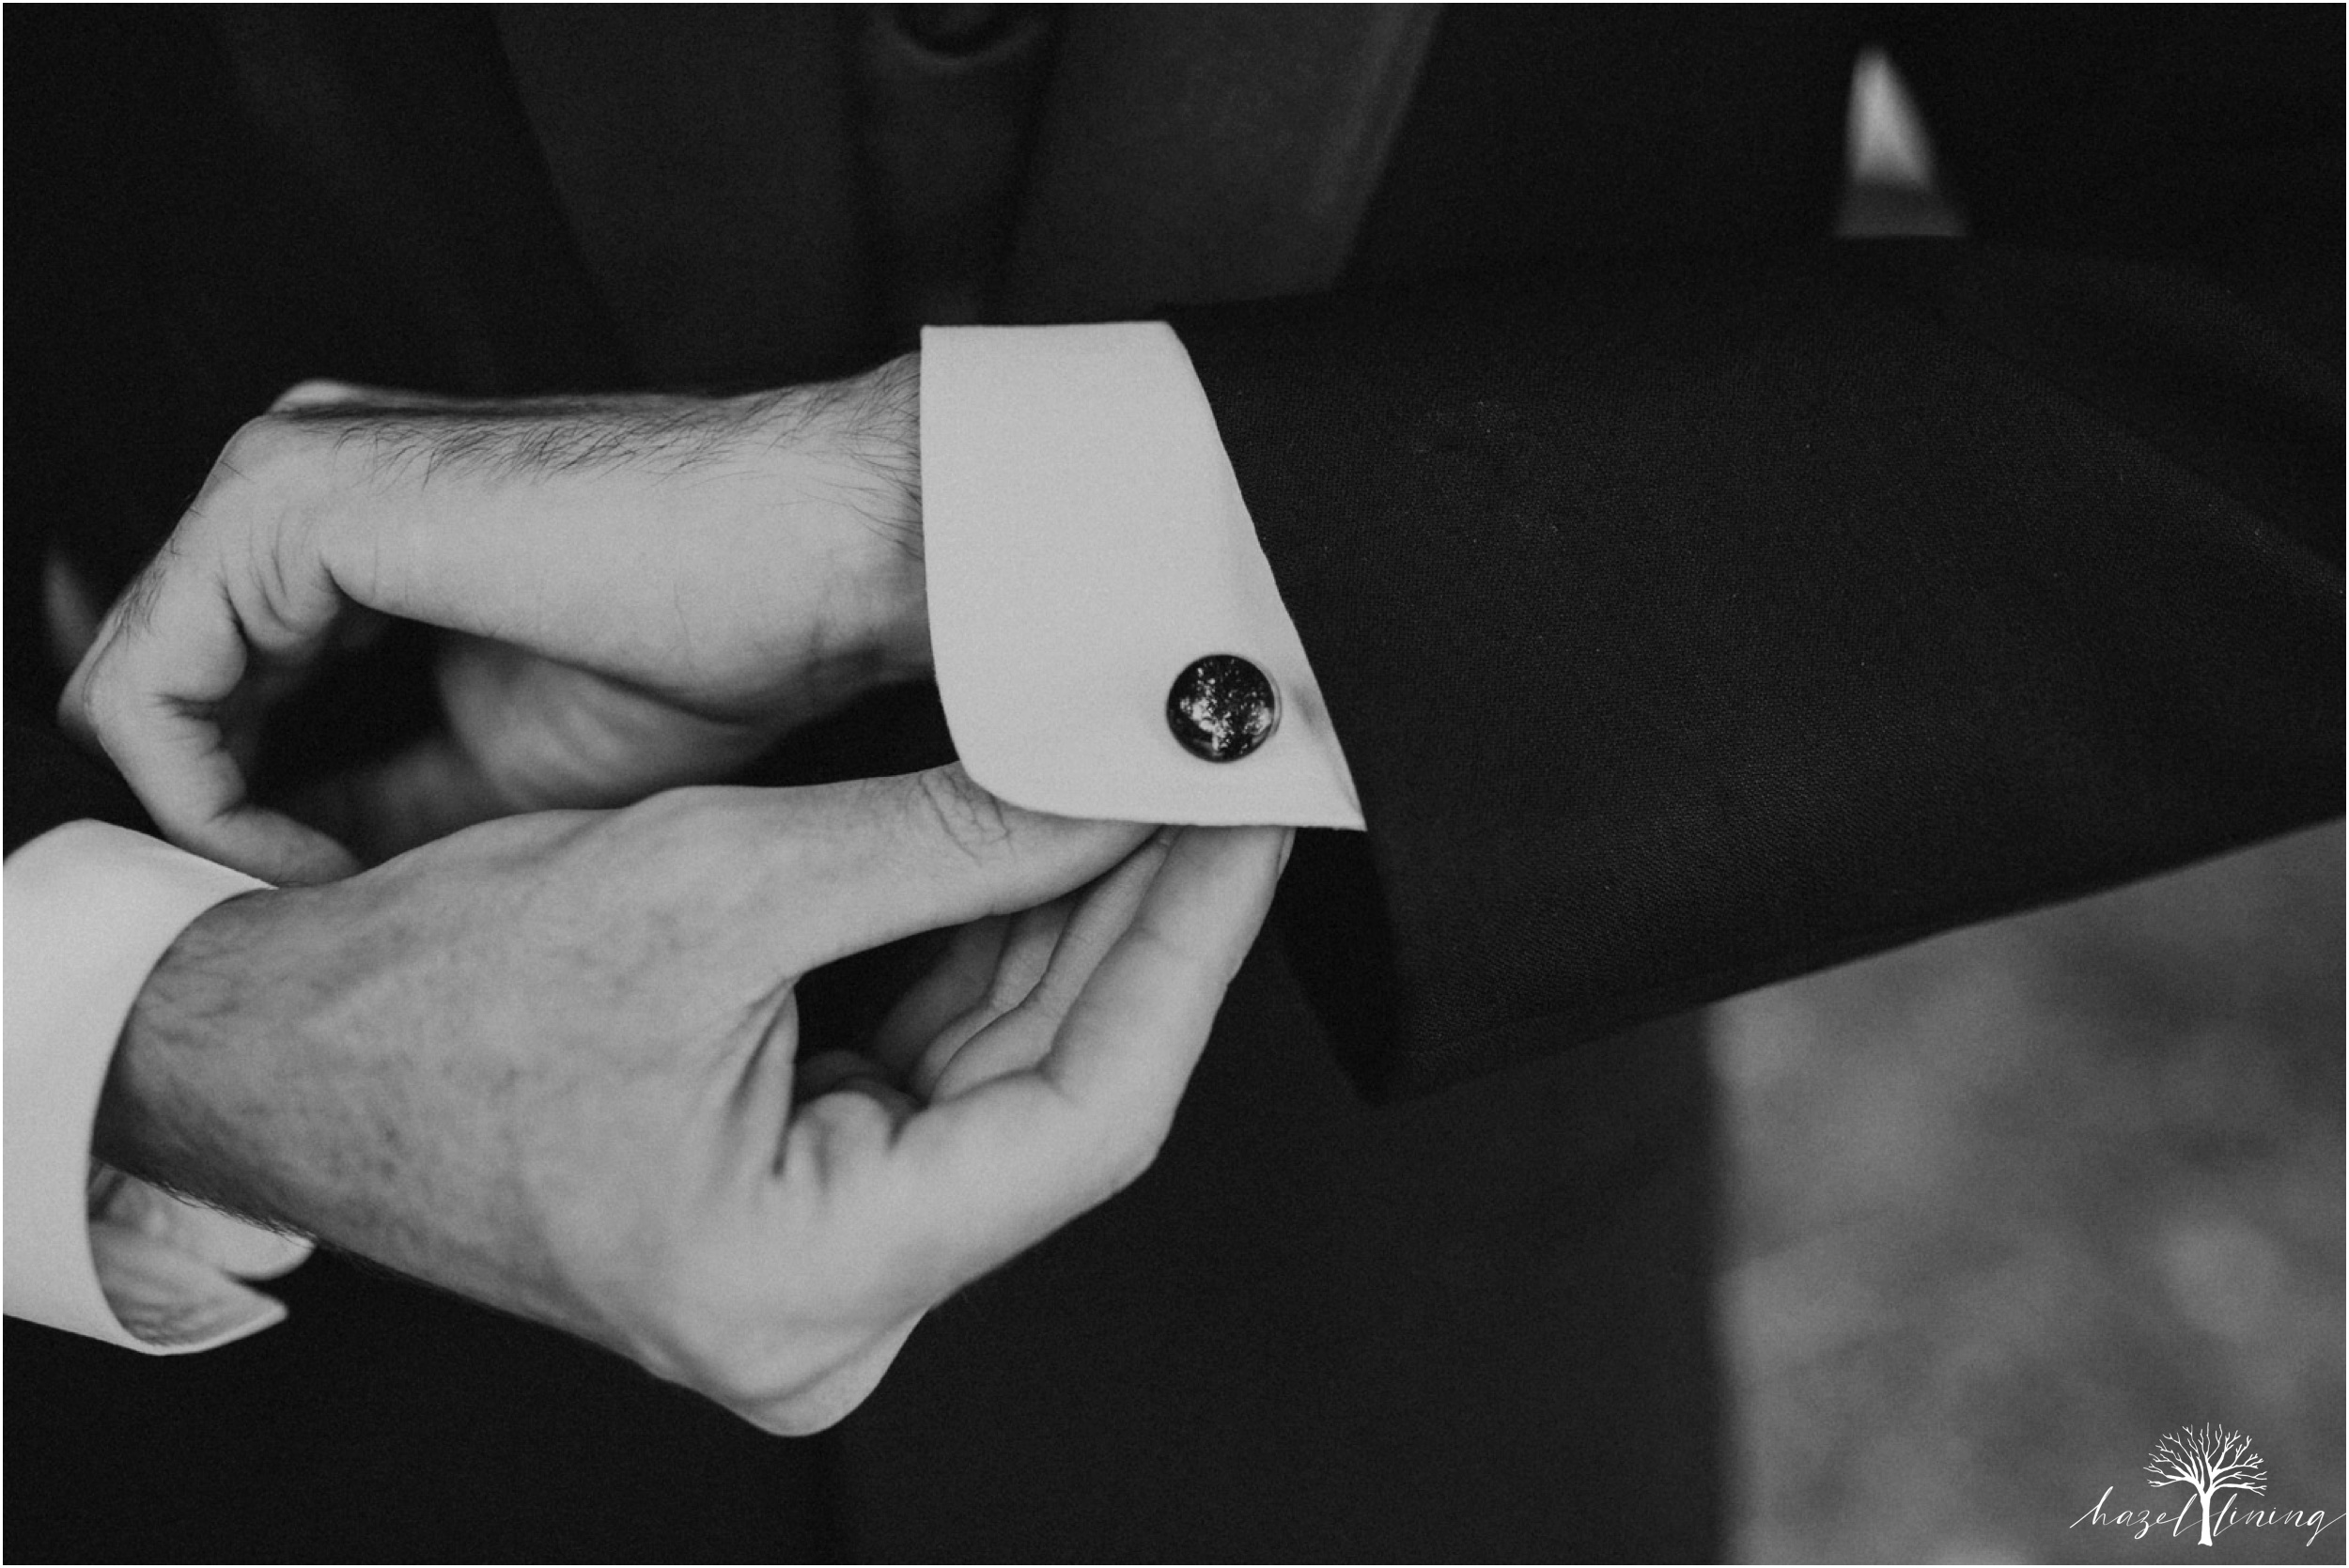 maureen-hepner-anthony-giordano-rose-bank-winery-newtow-pennsylvania-luxury-summer-wedding-hazel-lining-photography-destination-elopement-wedding-engagement-photography_0044.jpg